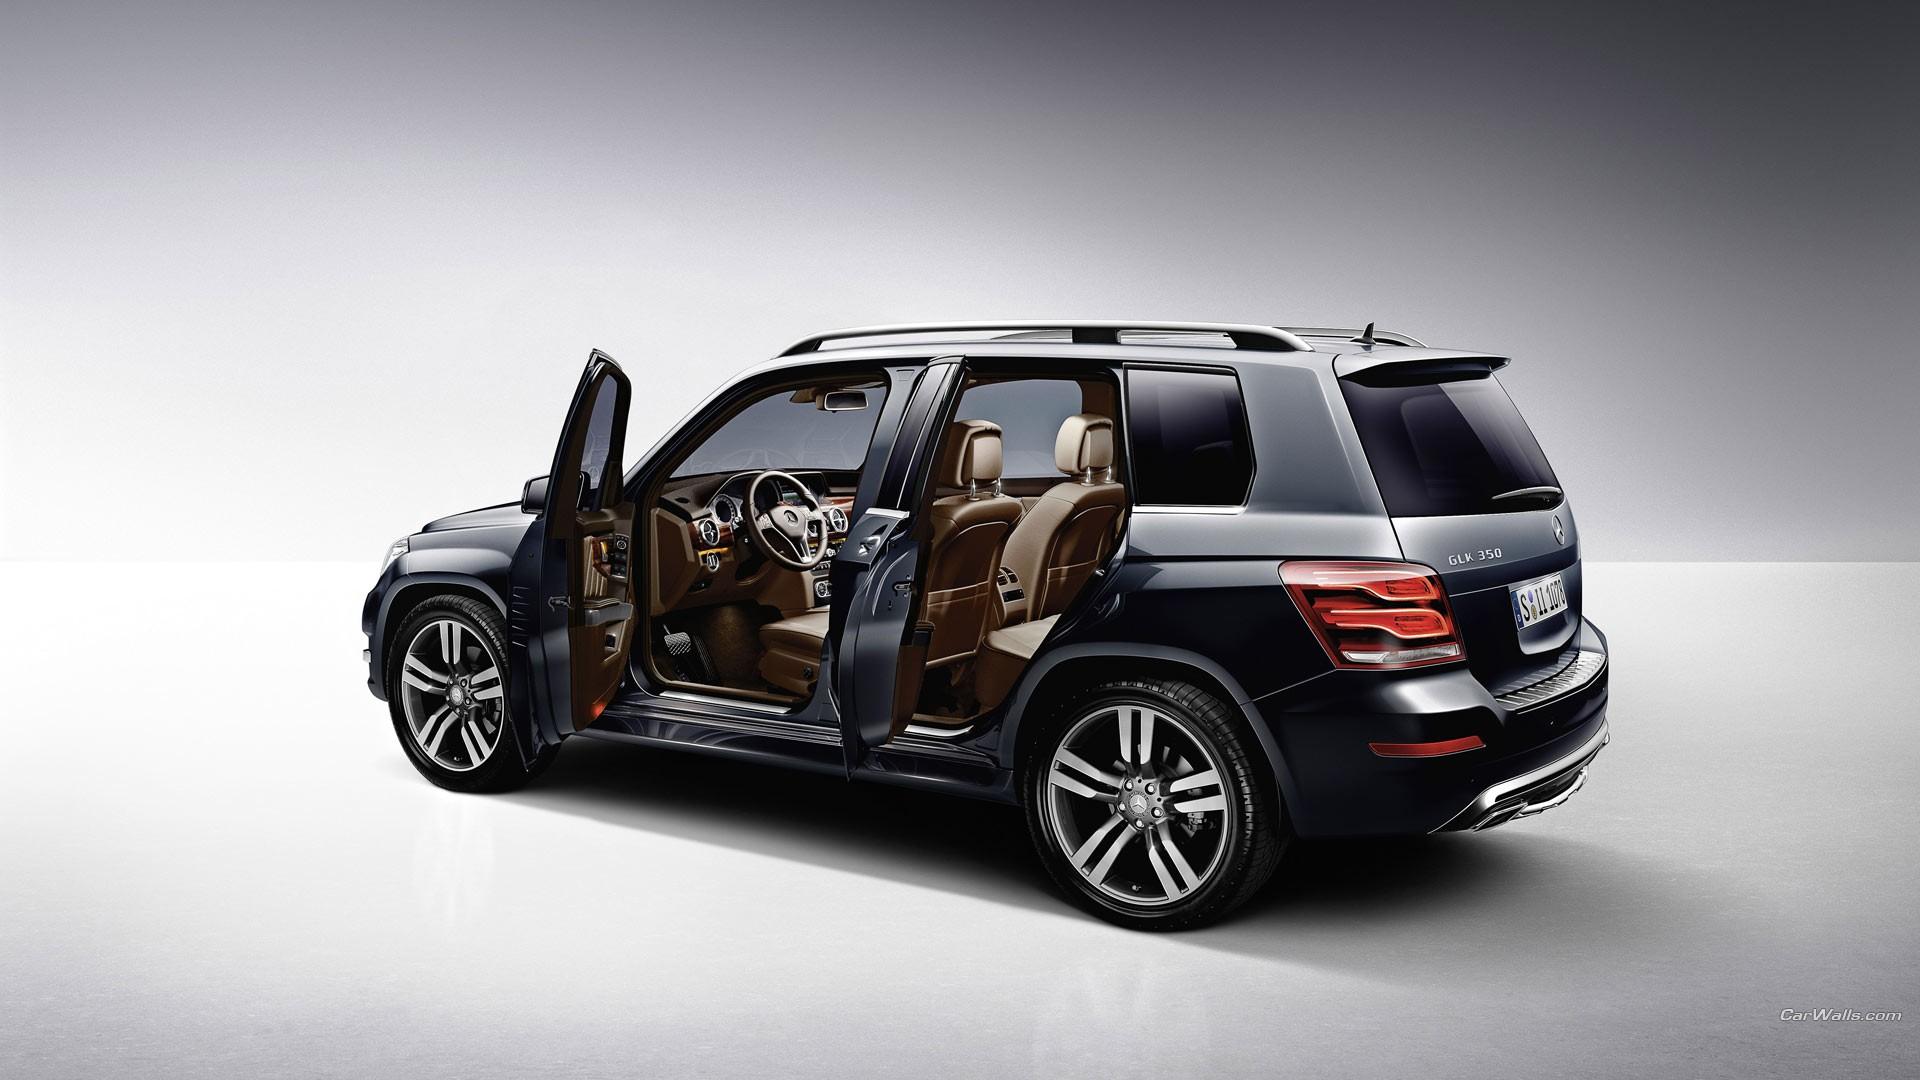 mercedes glk german cars car interior suv mercedes benz car vehicle